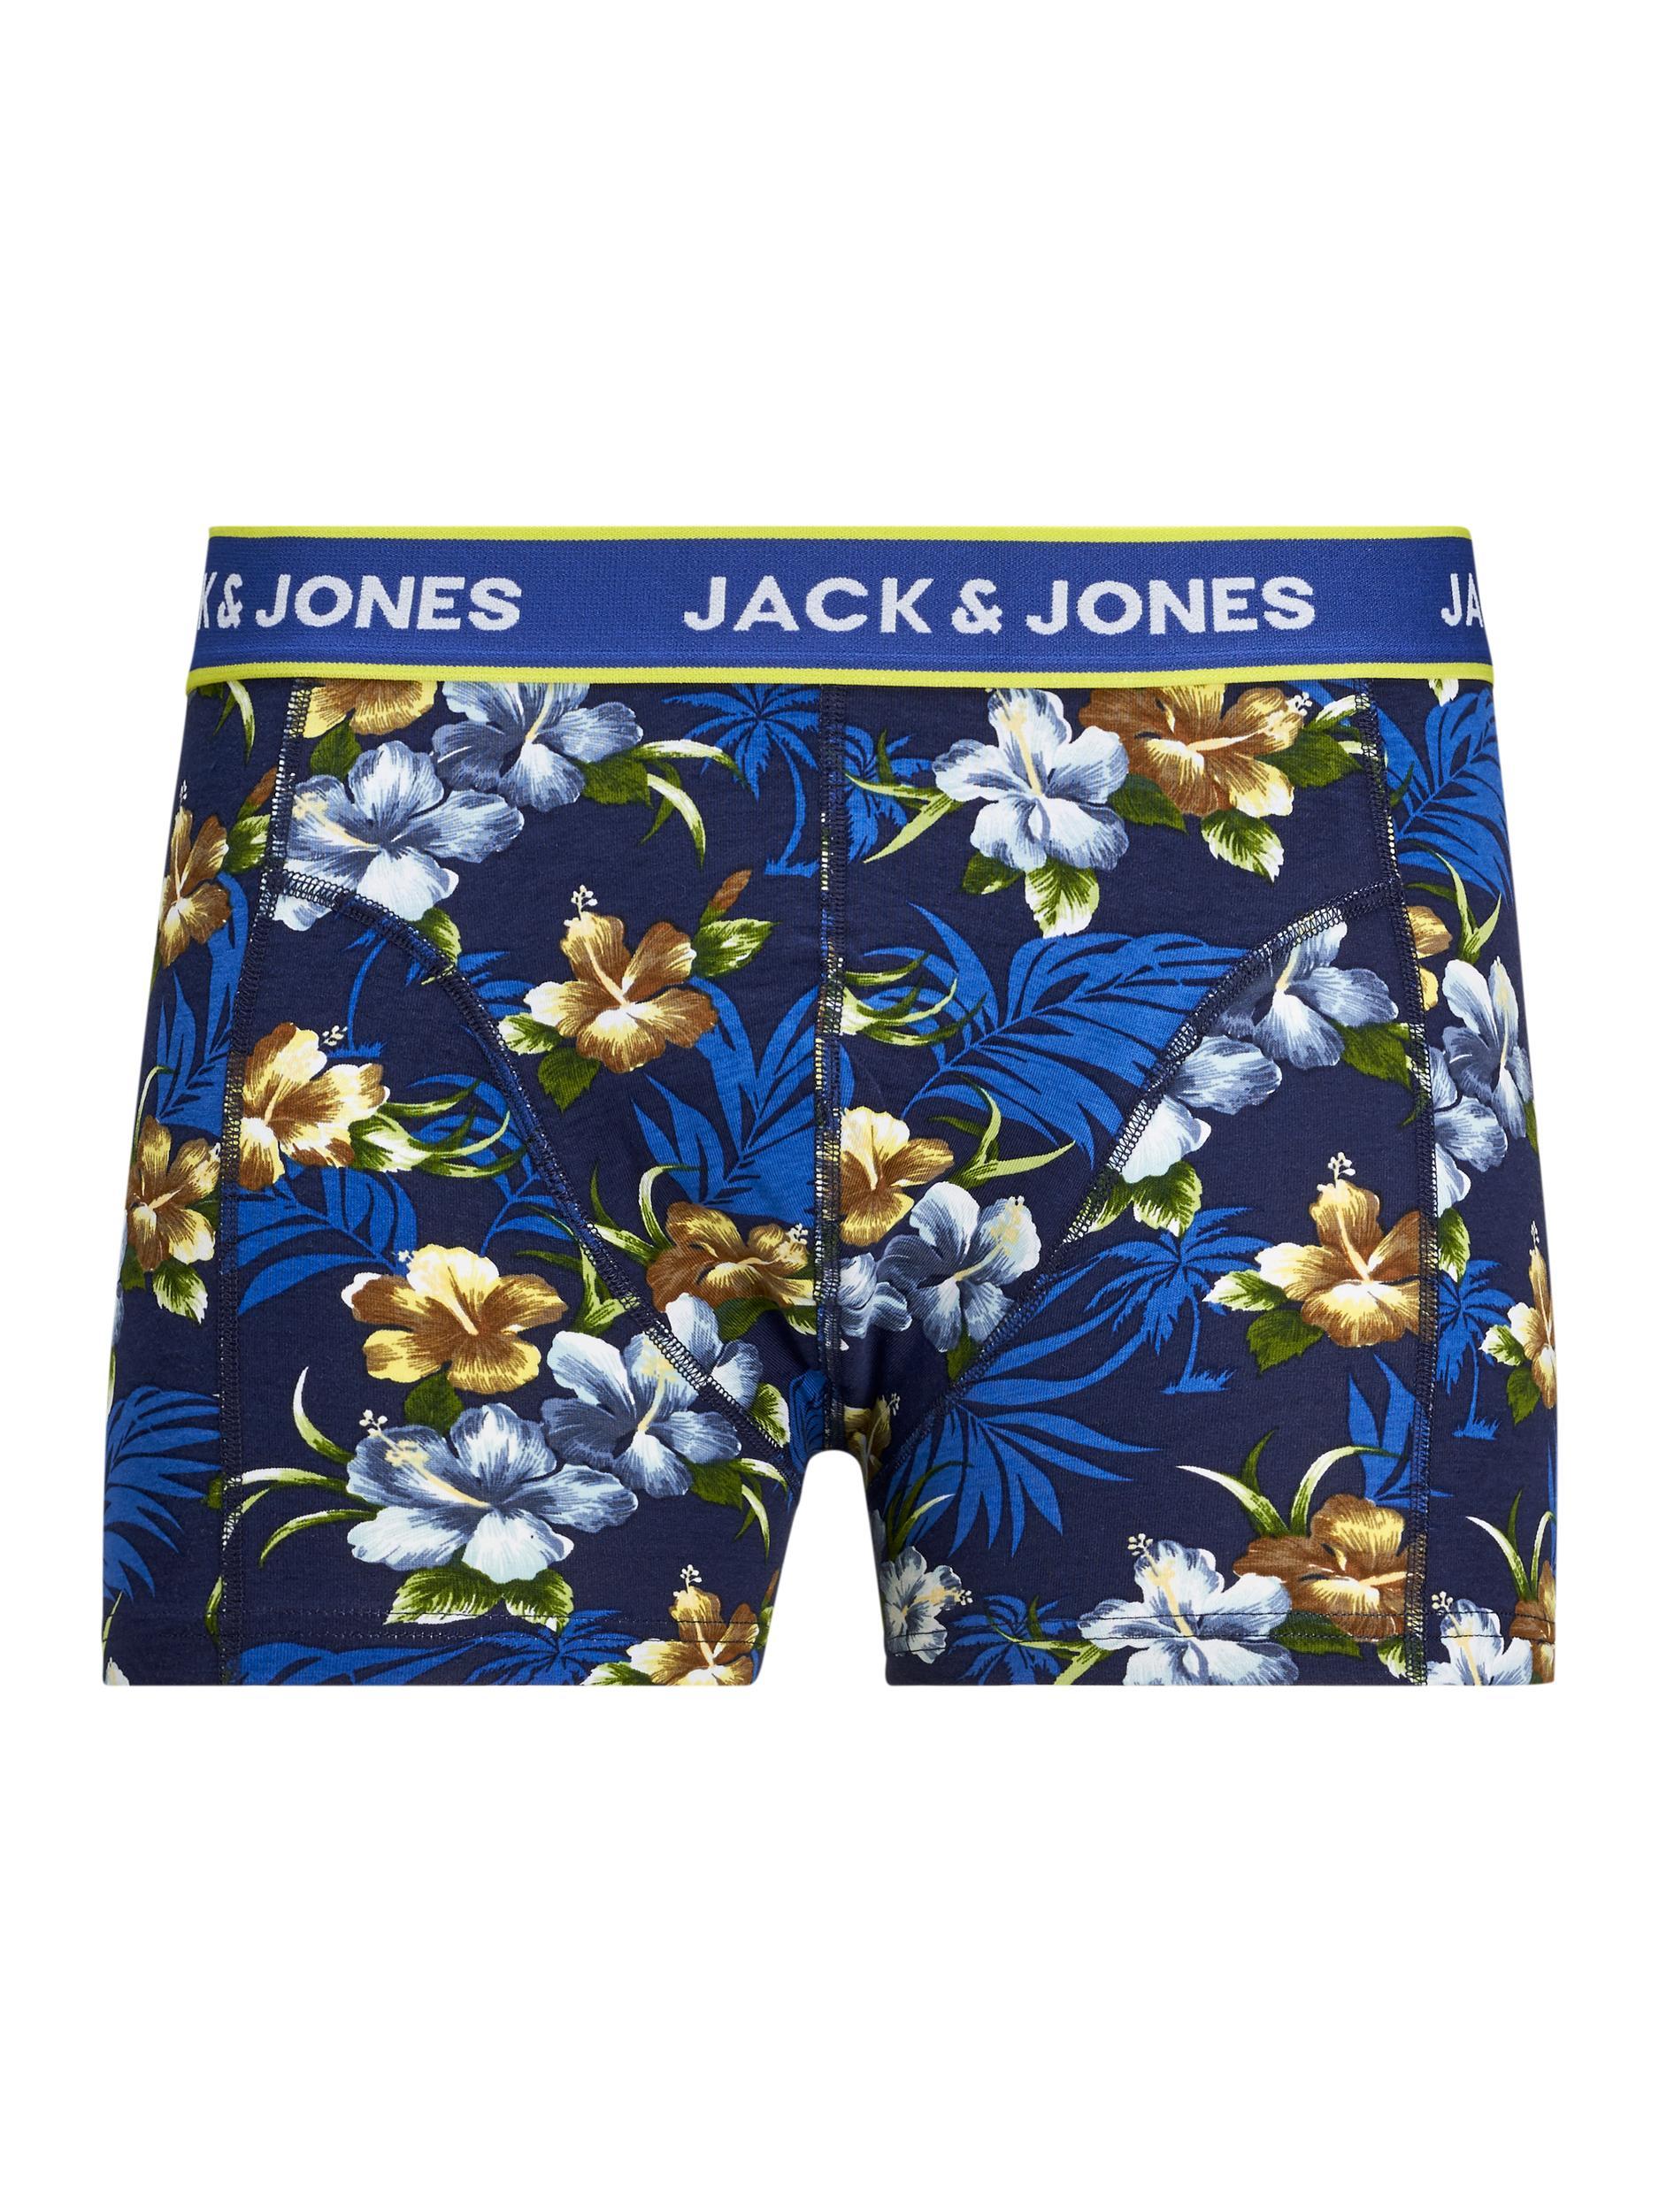 Jack&Jones Flower 3-pak Underbukser, Sort, Small